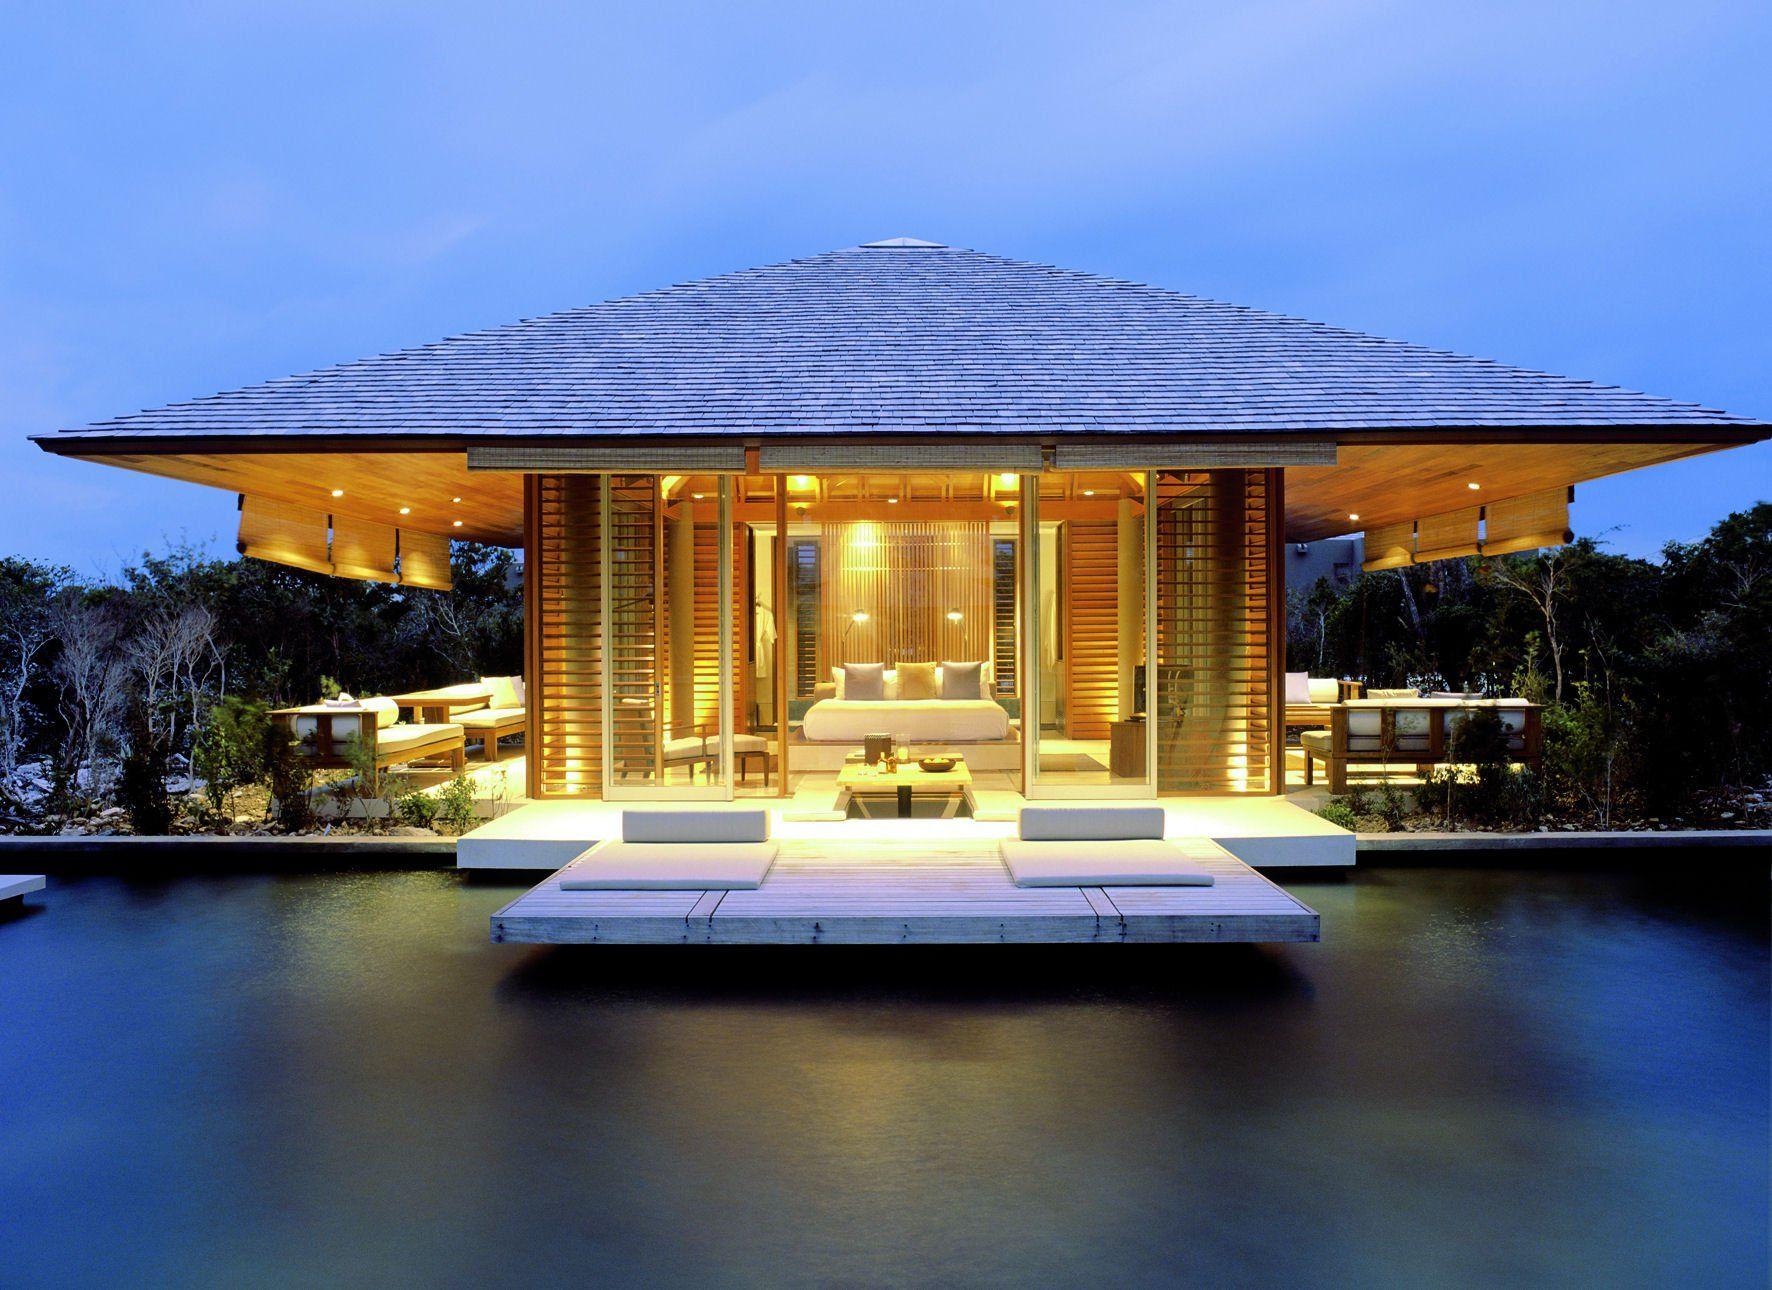 Architecting And Interior